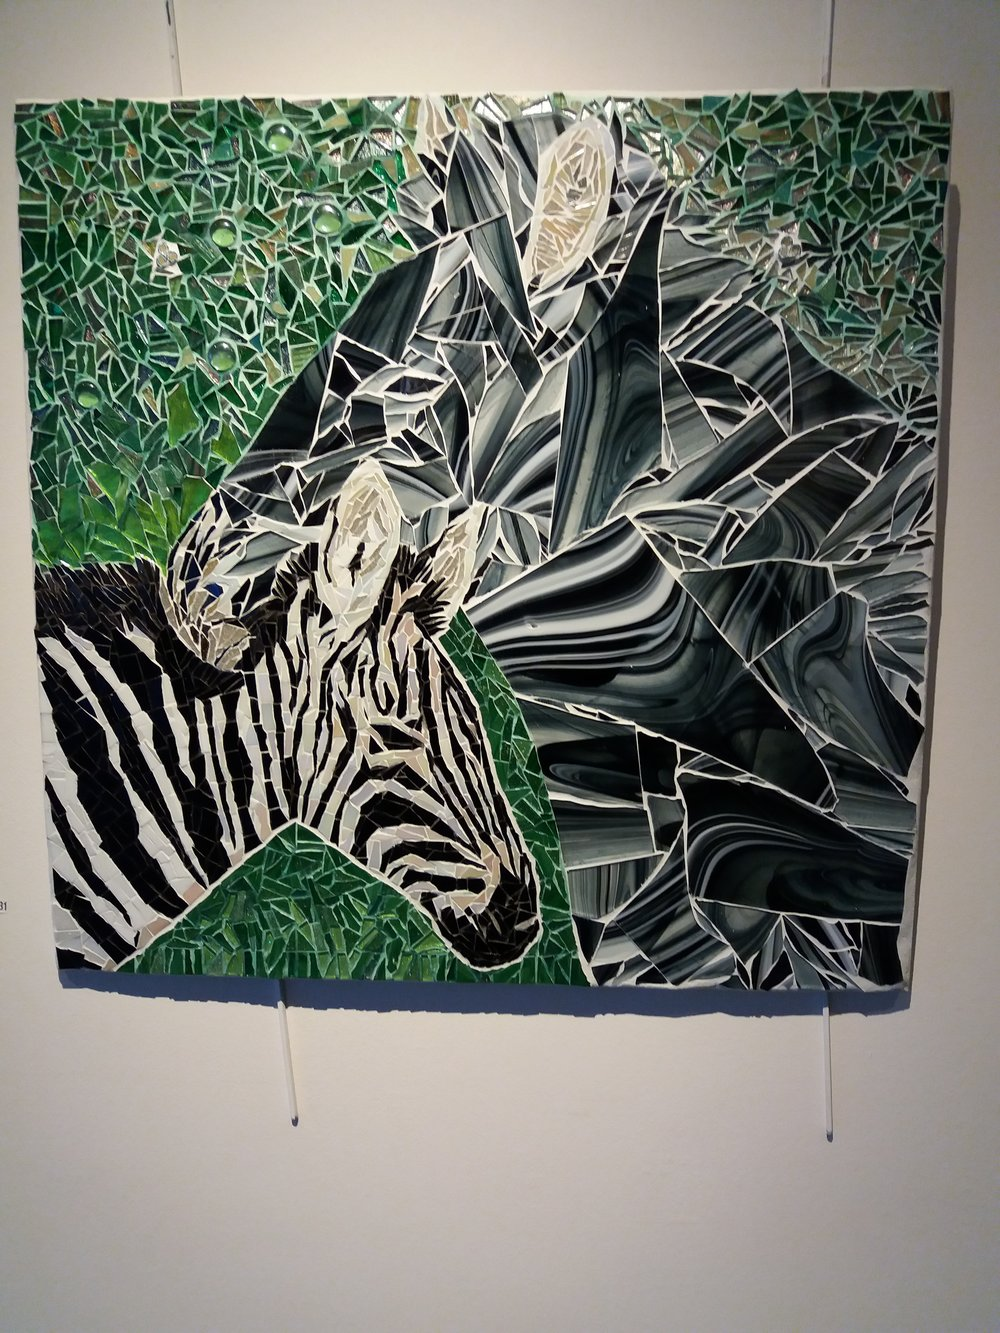 Zebras Mosaic